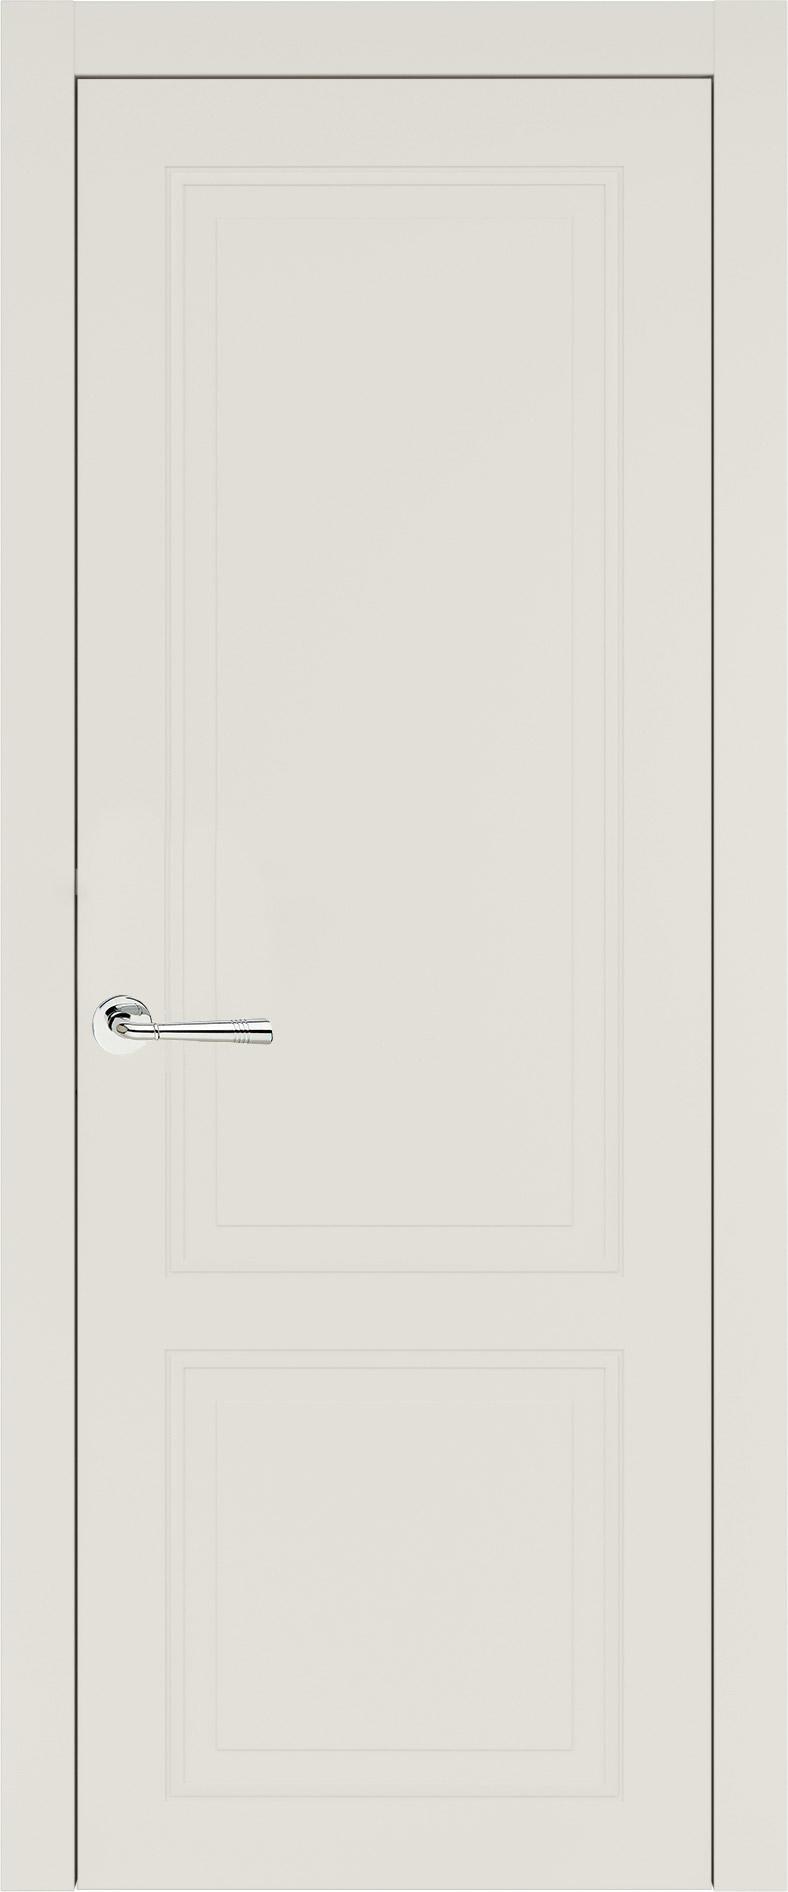 Dinastia Neo Classic цвет - Бежевая эмаль (RAL 9010) Без стекла (ДГ)